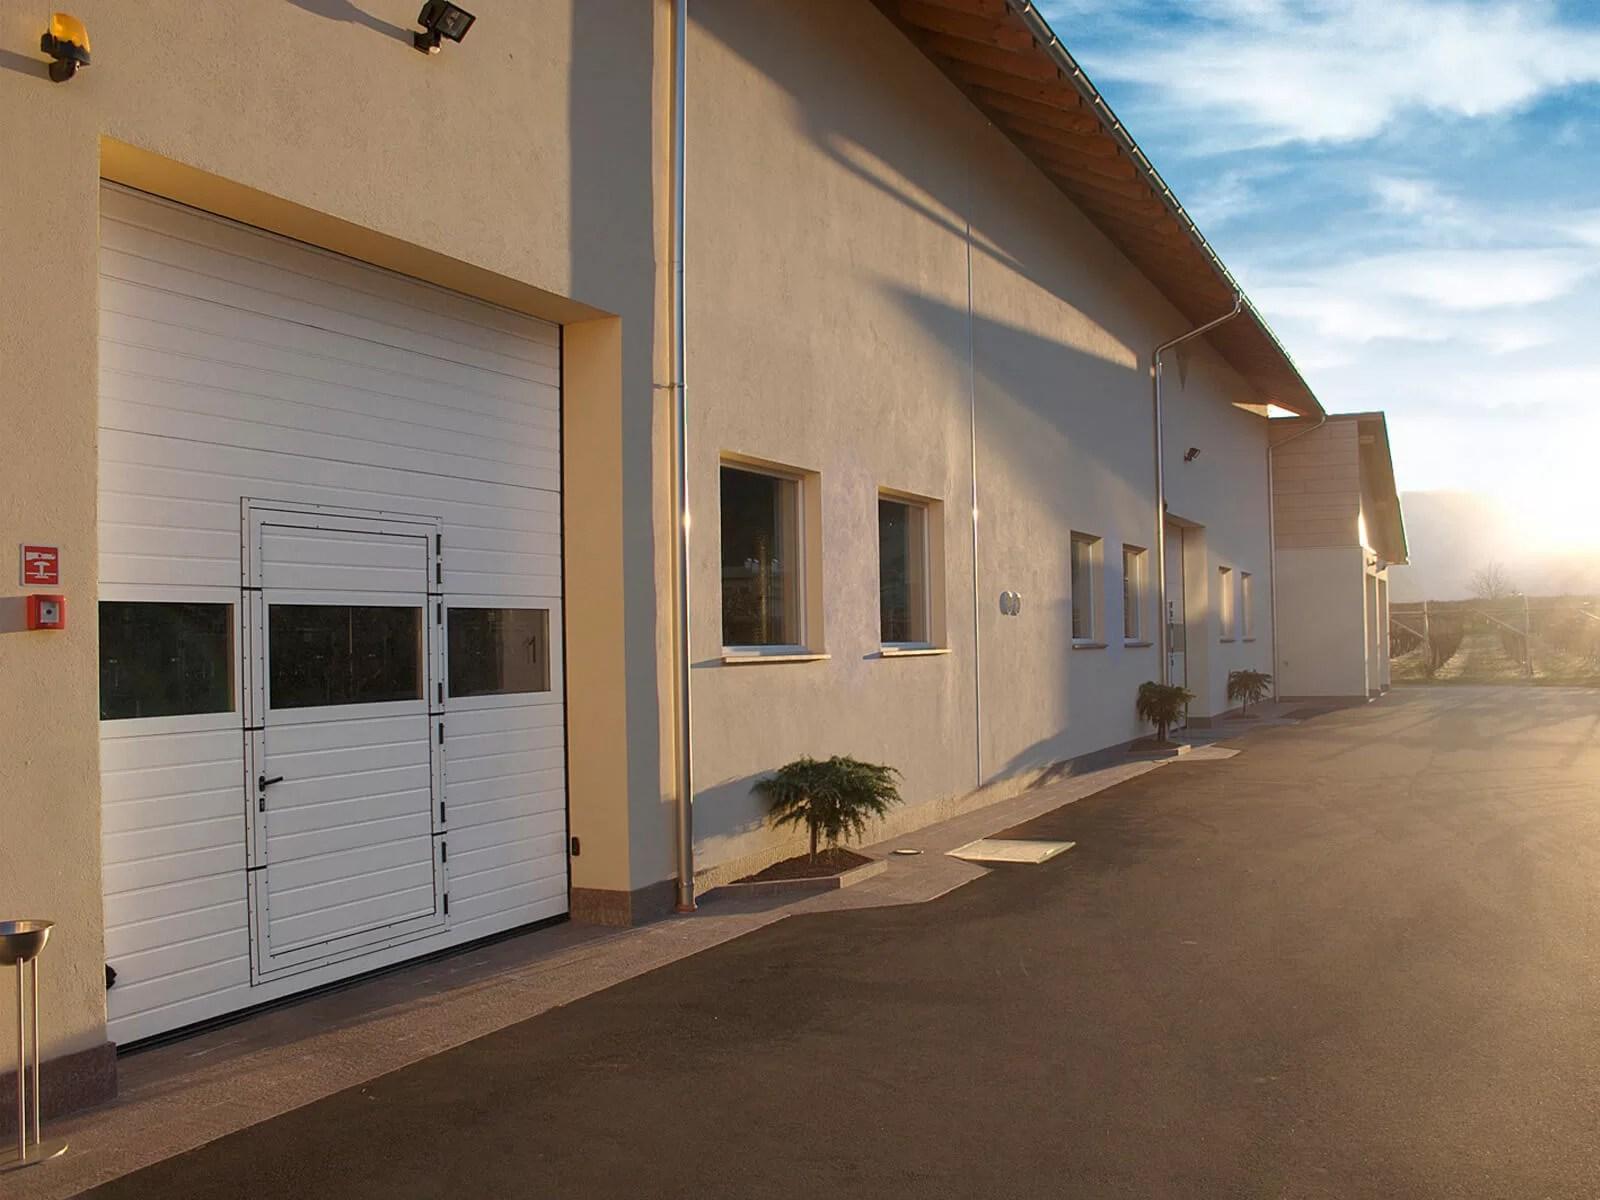 Portone sezionale industriale SECURA - Stucco bianco C21 Visa porta pedonale